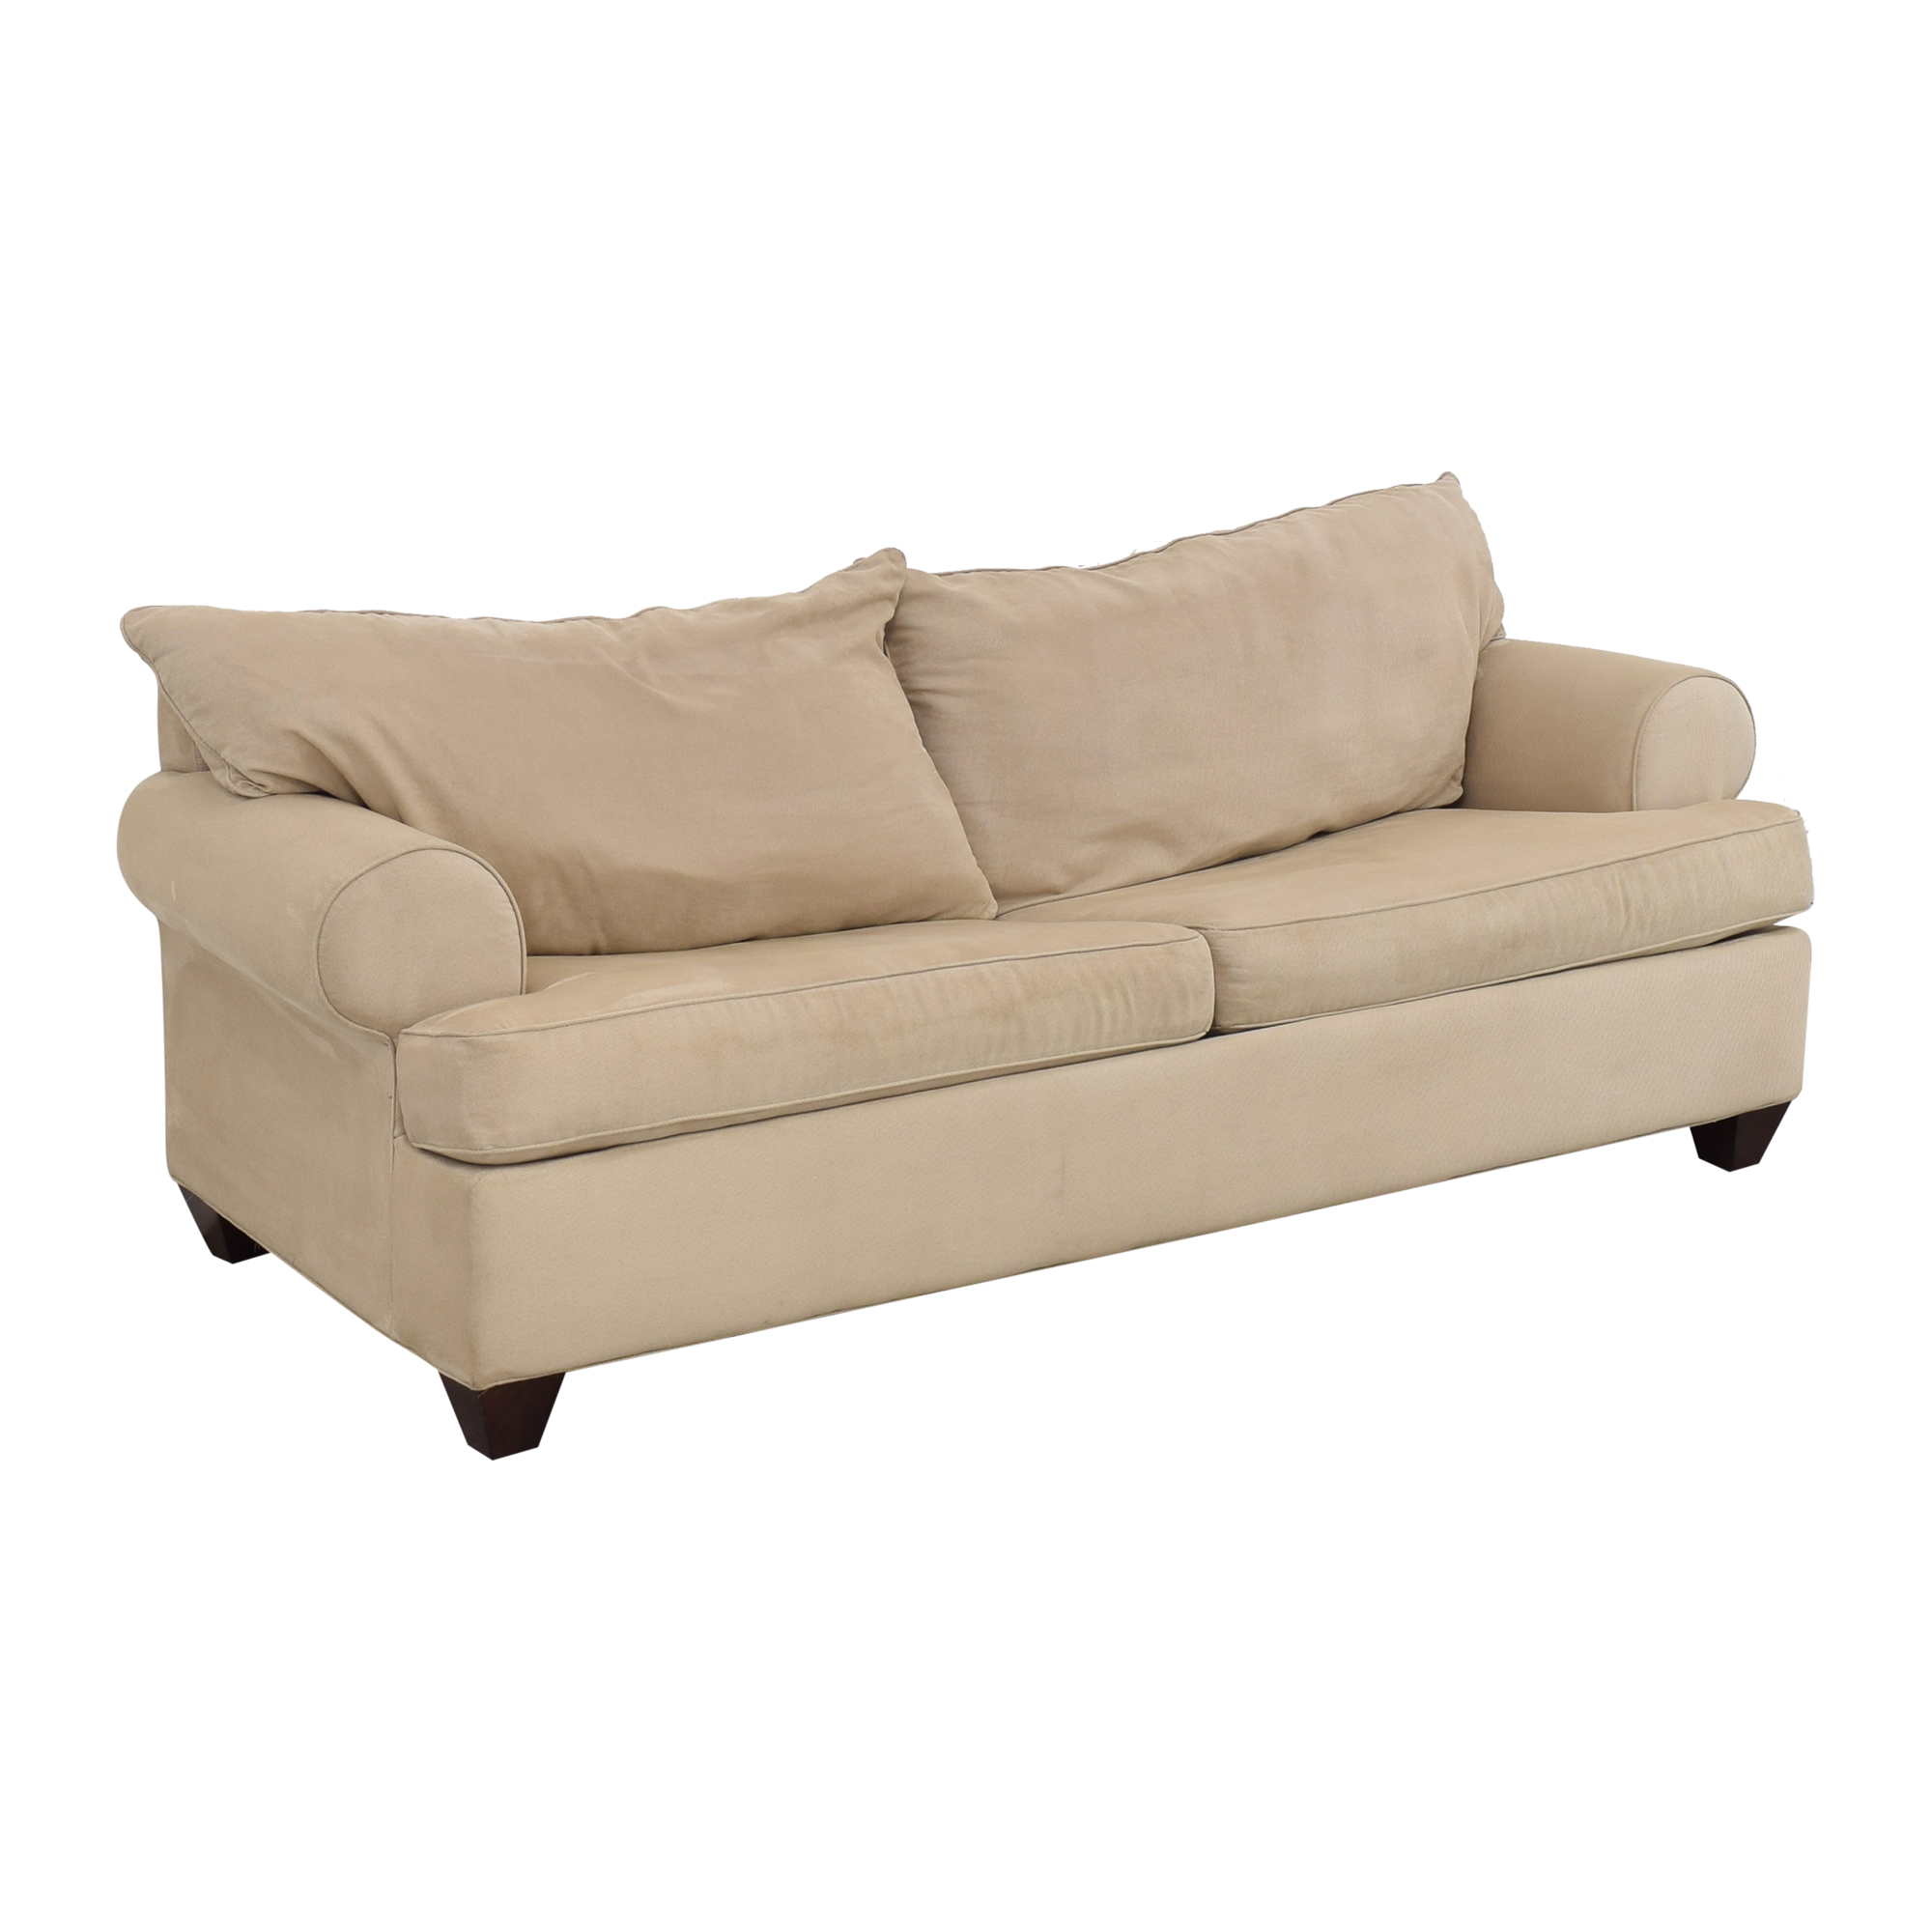 Raymour & Flanigan Raymour & Flanigan Sleeper Sofa price